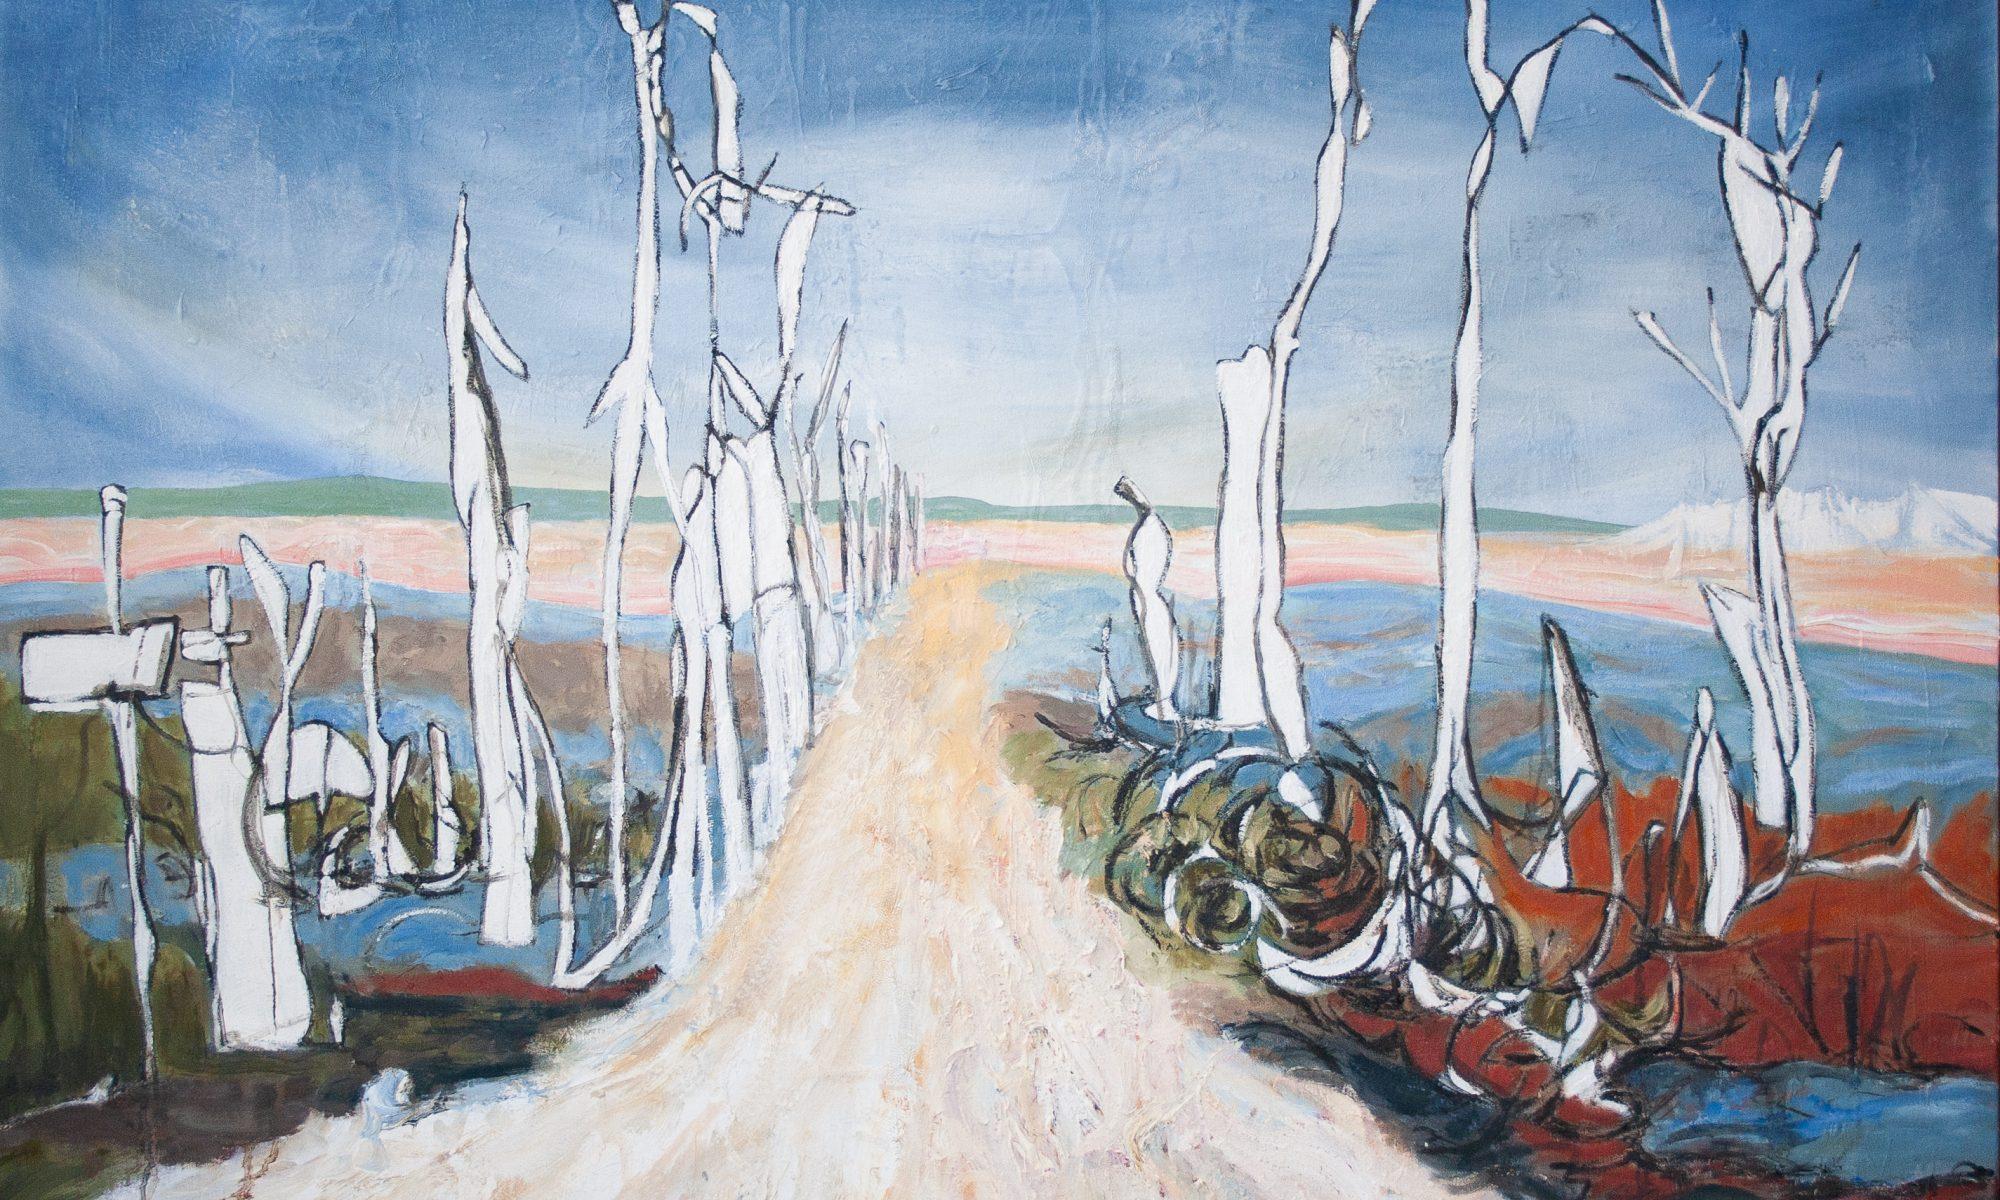 Blind Contour Homage: Hamilton by Marlene Lowden